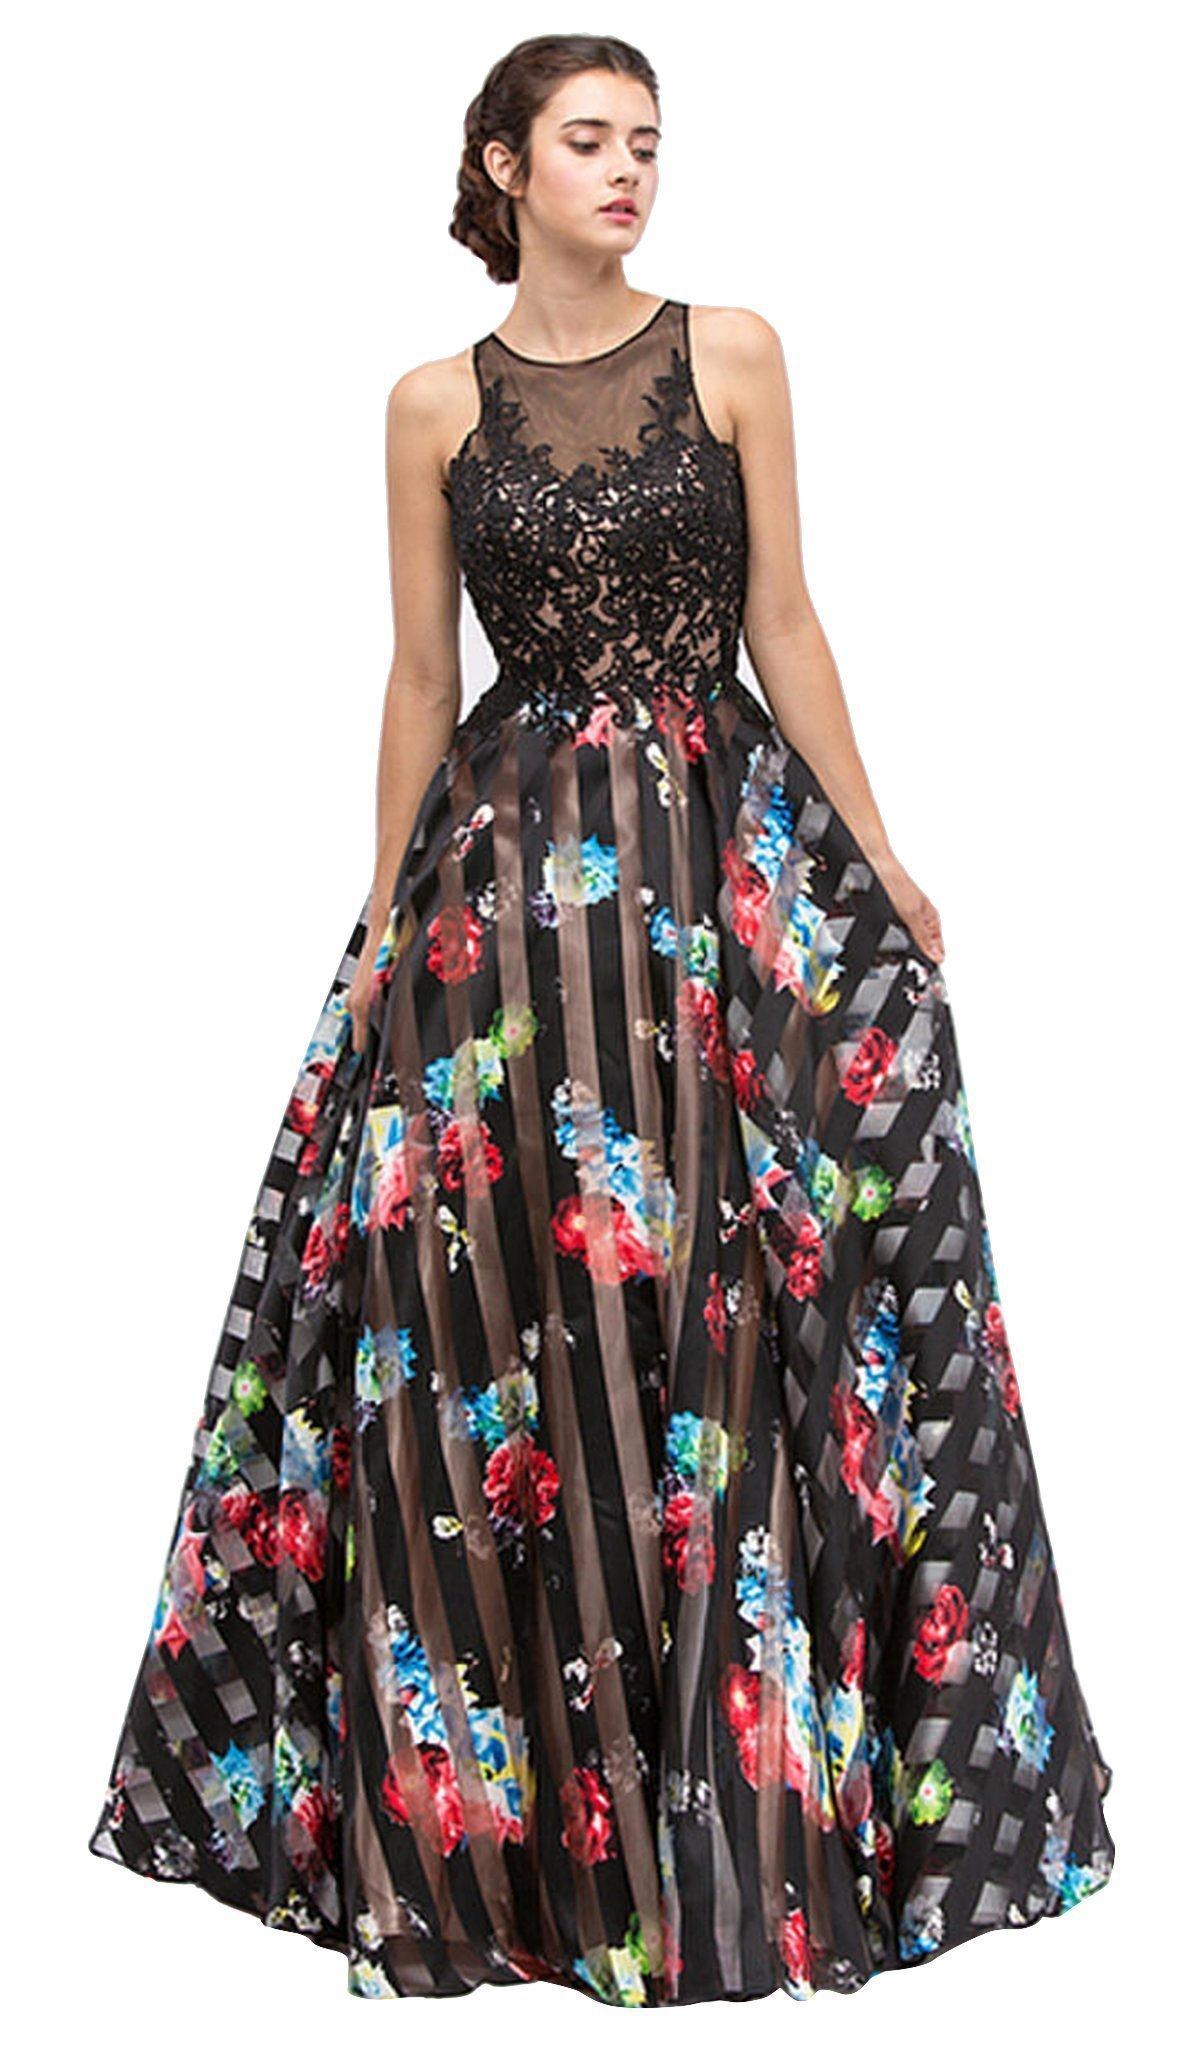 Eureka Fashion - Lace Stripe Floral Evening Gown